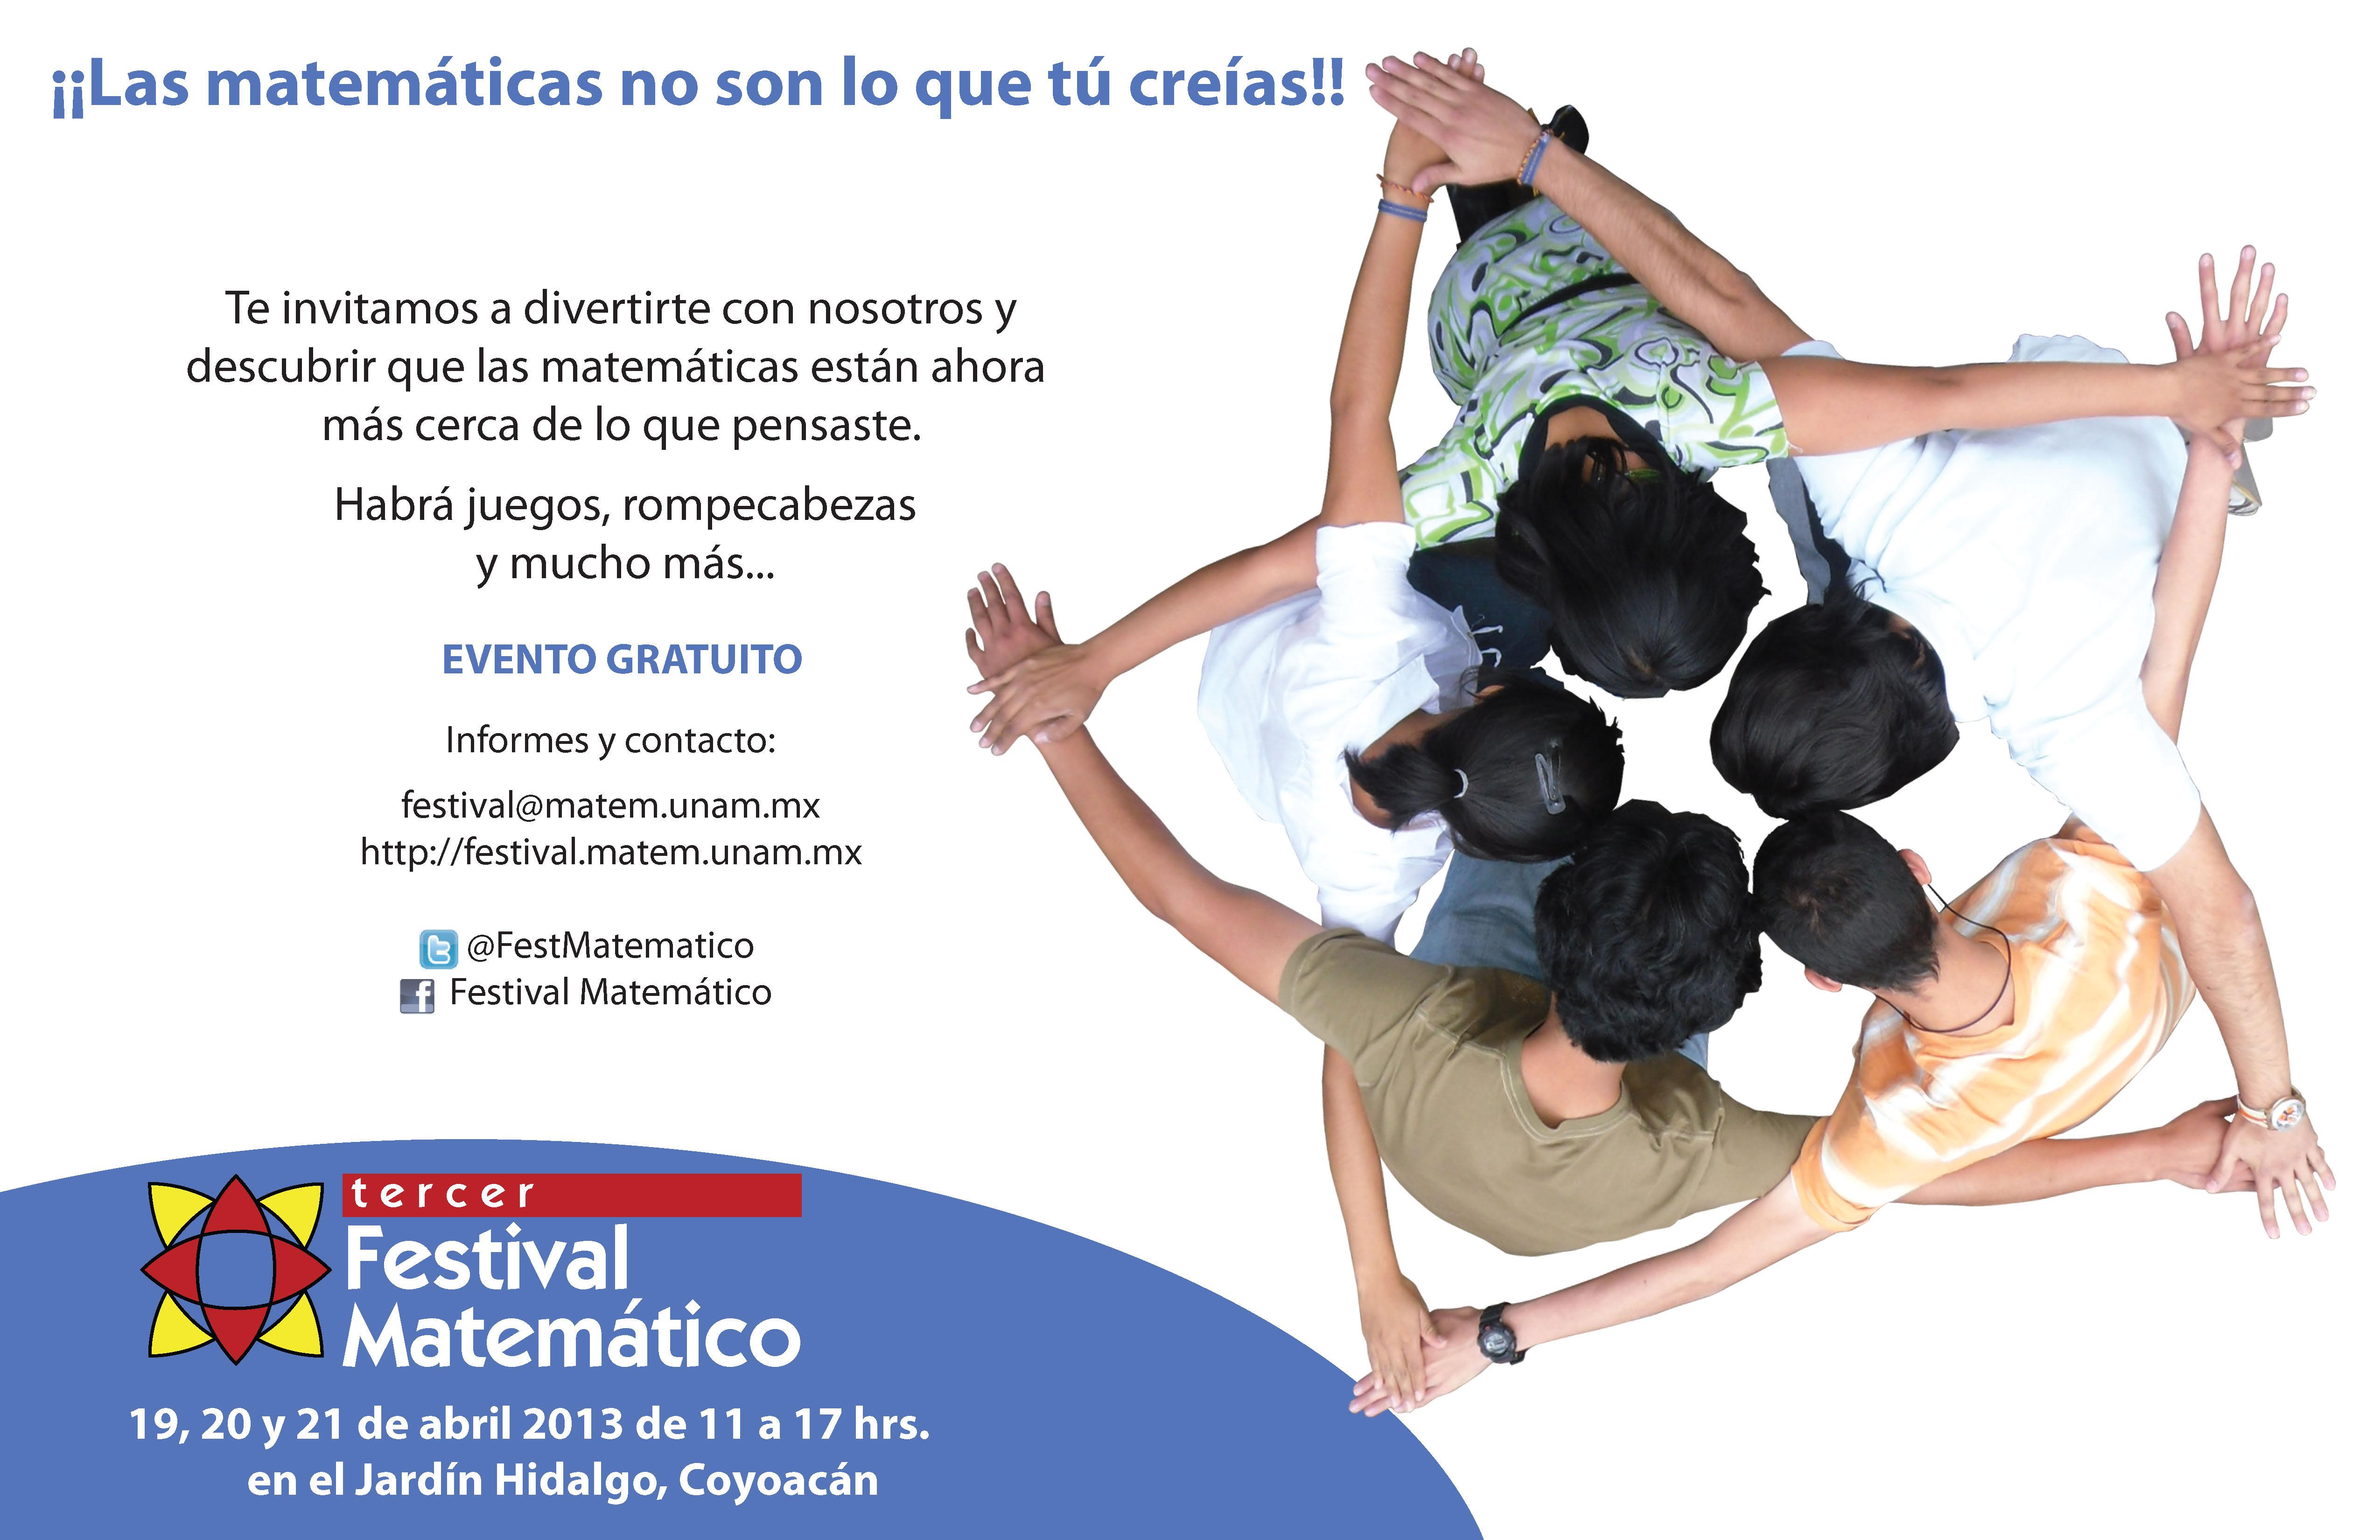 Tercer Festival Matemático